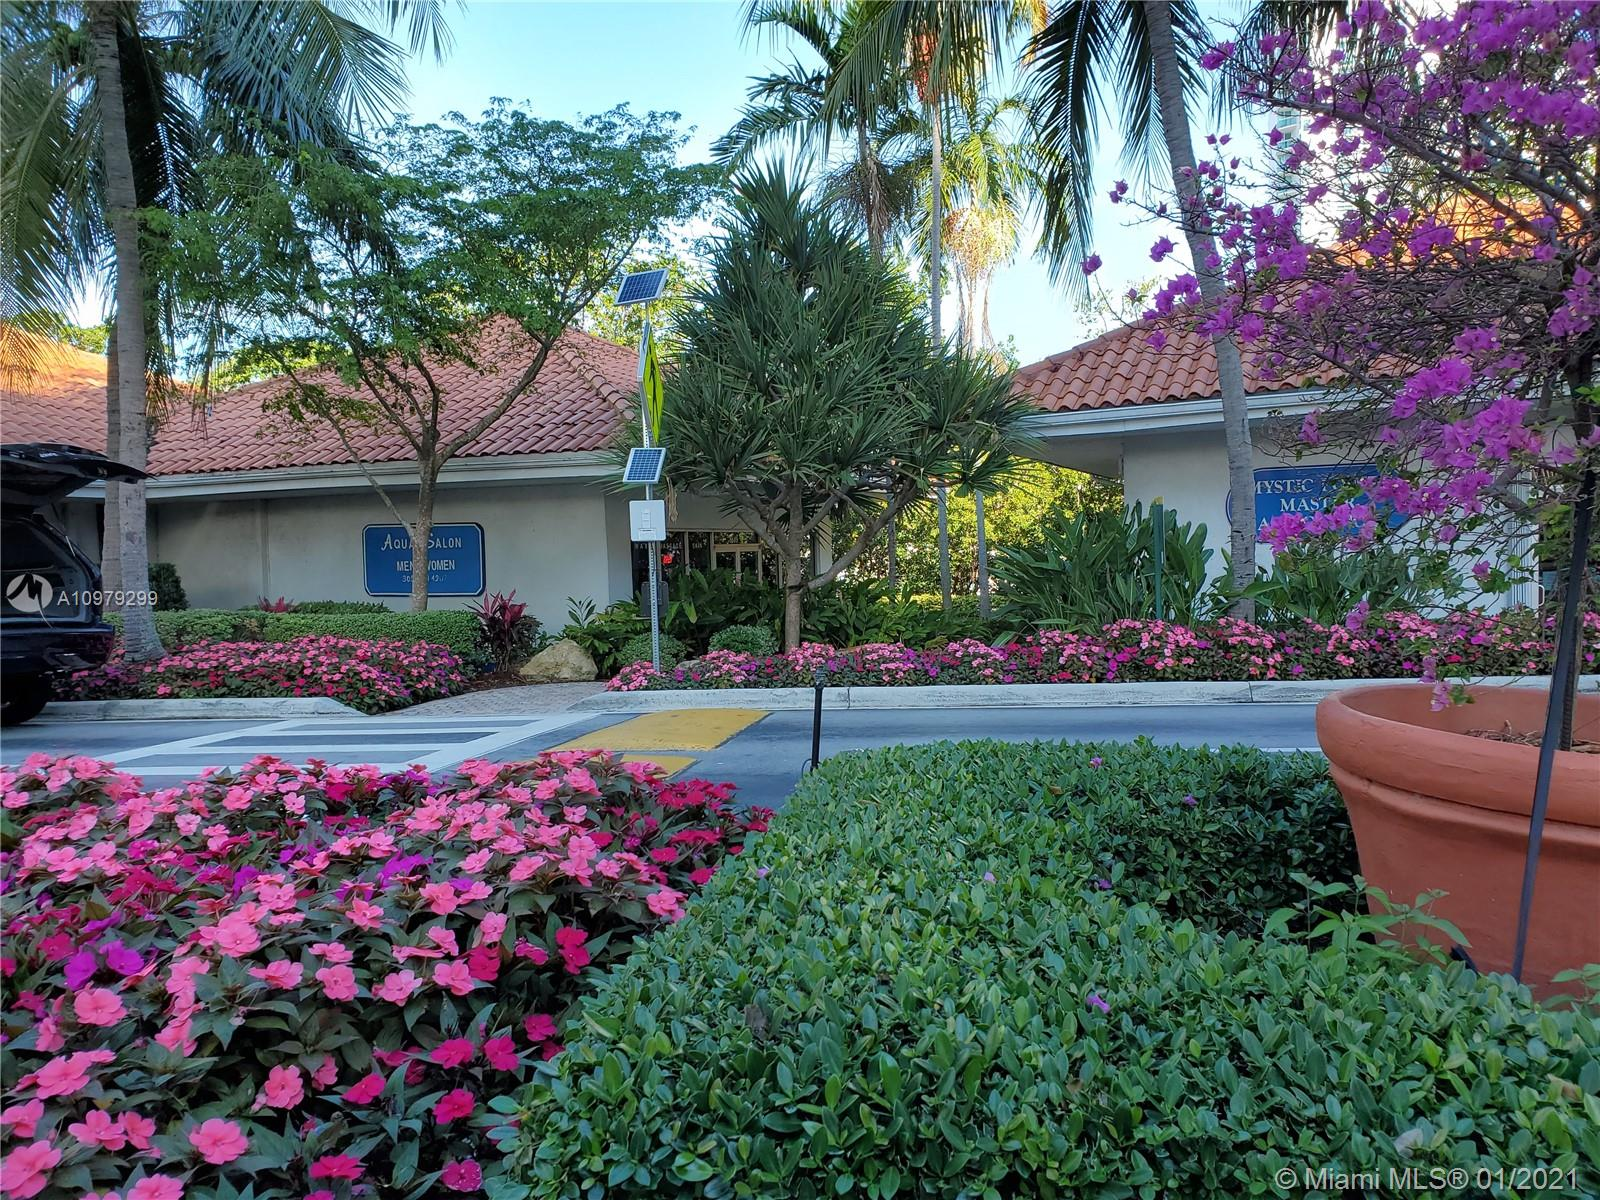 Photo of 3600 Mystic Pointe Dr #304, Aventura, Florida, 33180 -